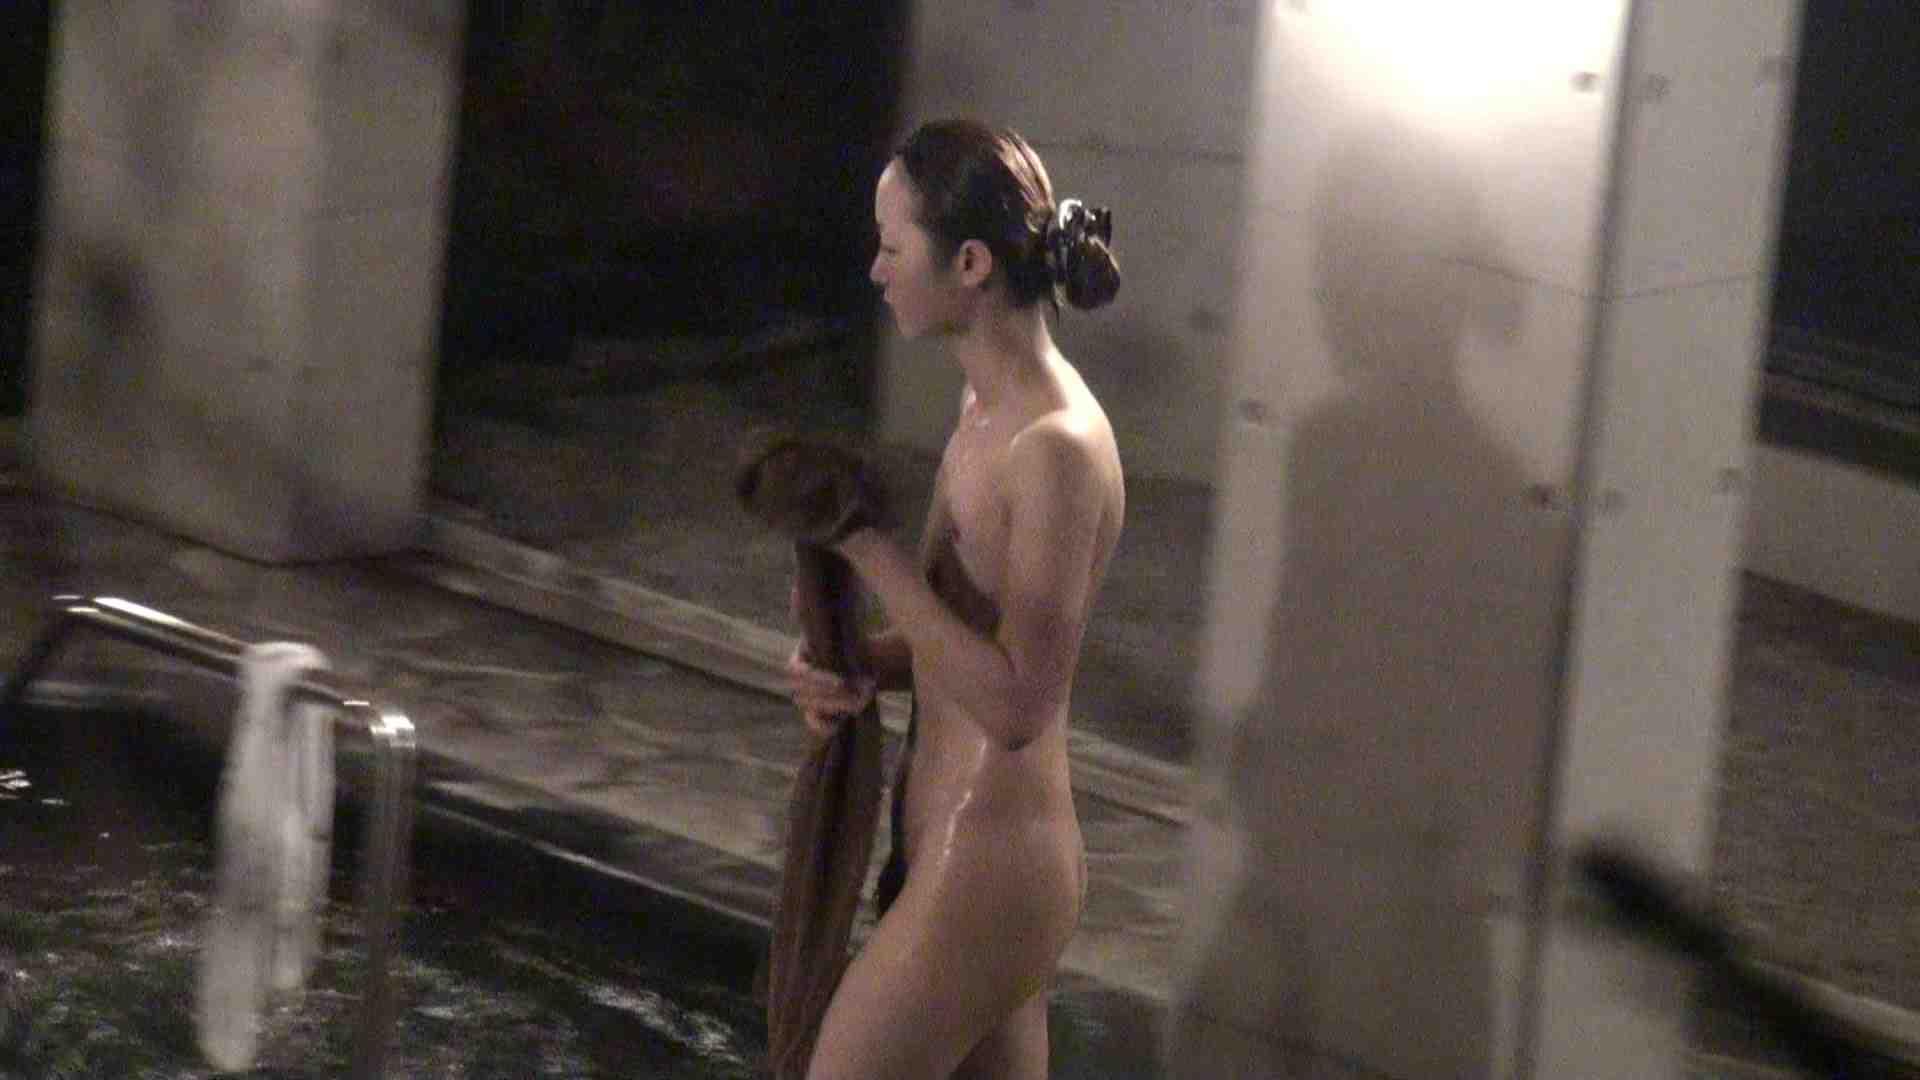 Aquaな露天風呂Vol.356 露天 おまんこ無修正動画無料 85画像 17